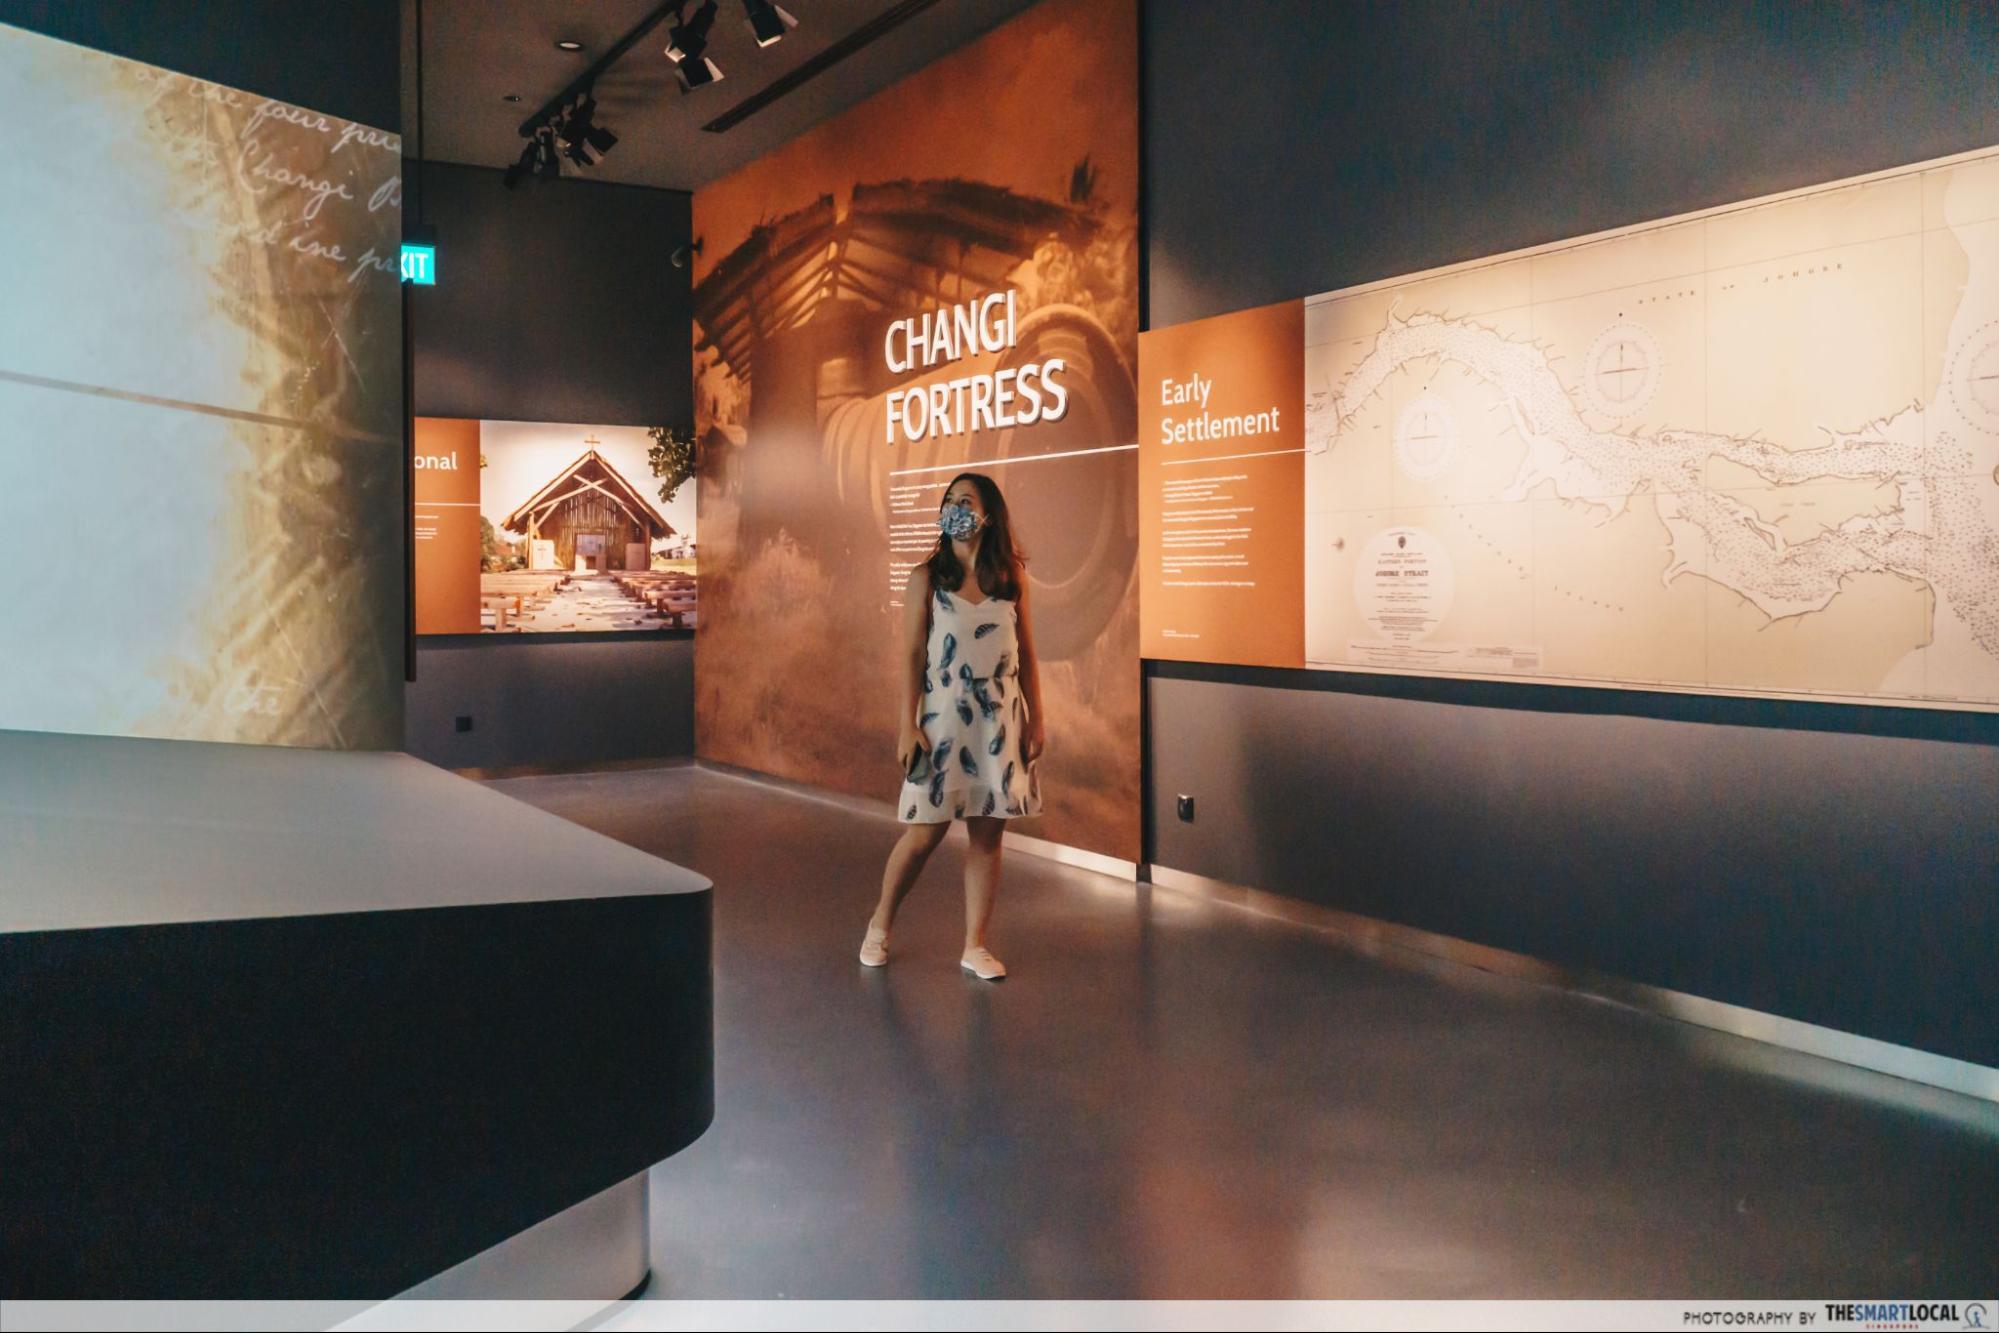 Changi Chapel and museum exhibit